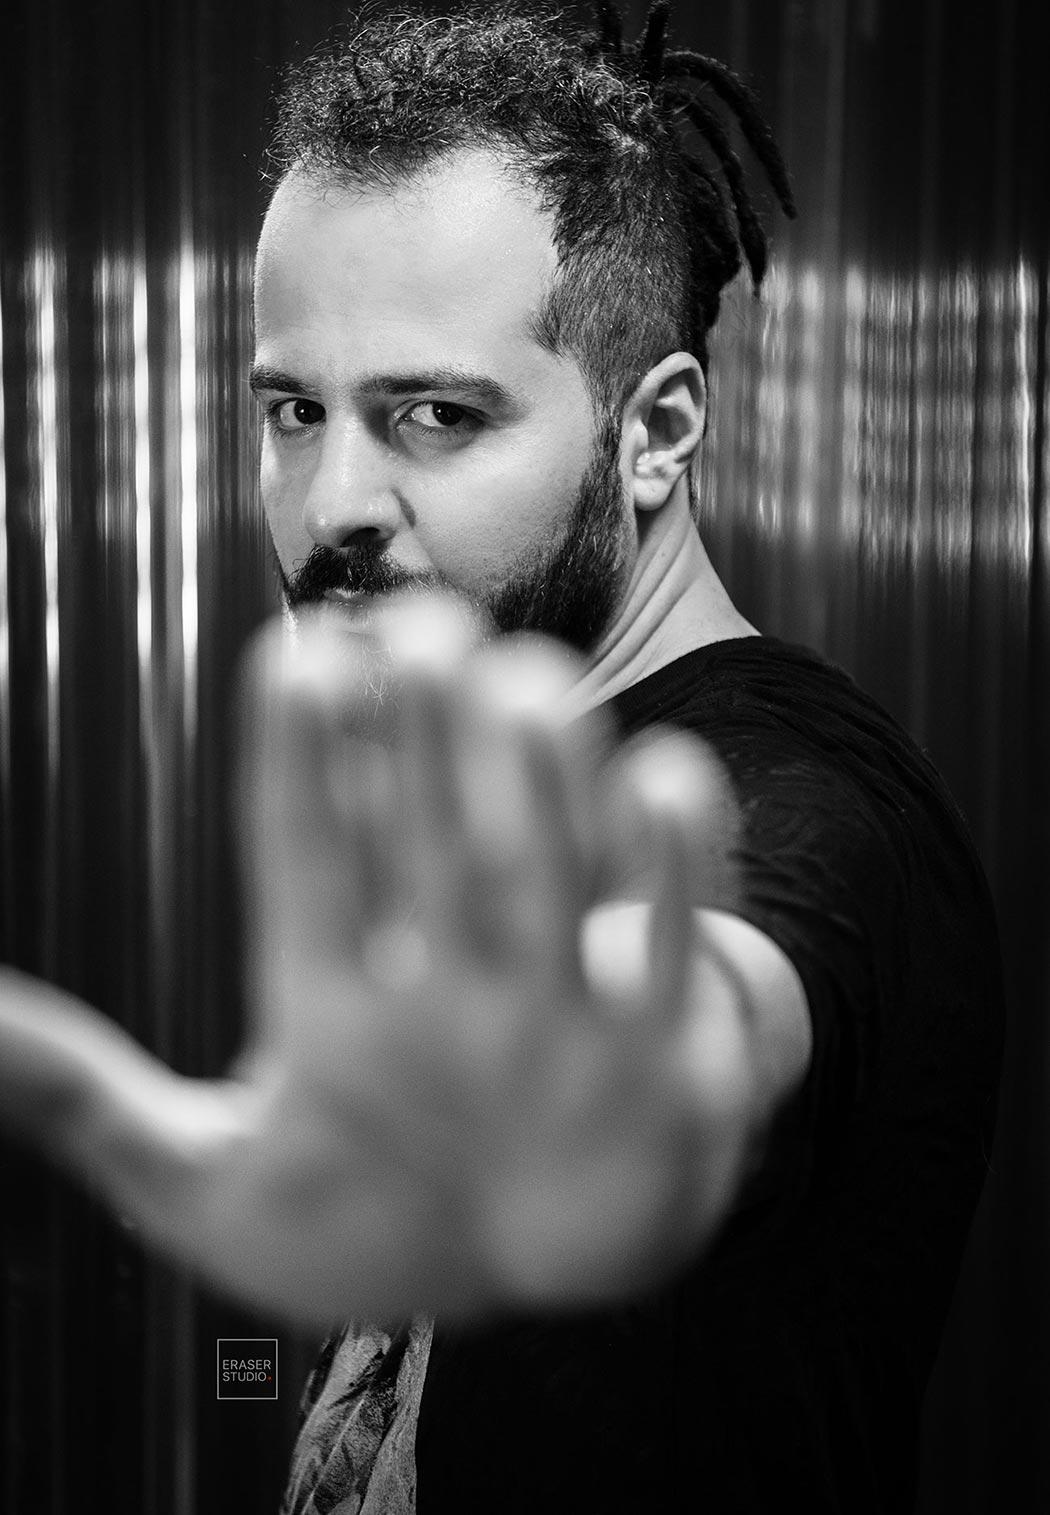 Portrait headshot Photography Eraser Studio Los Angeles California